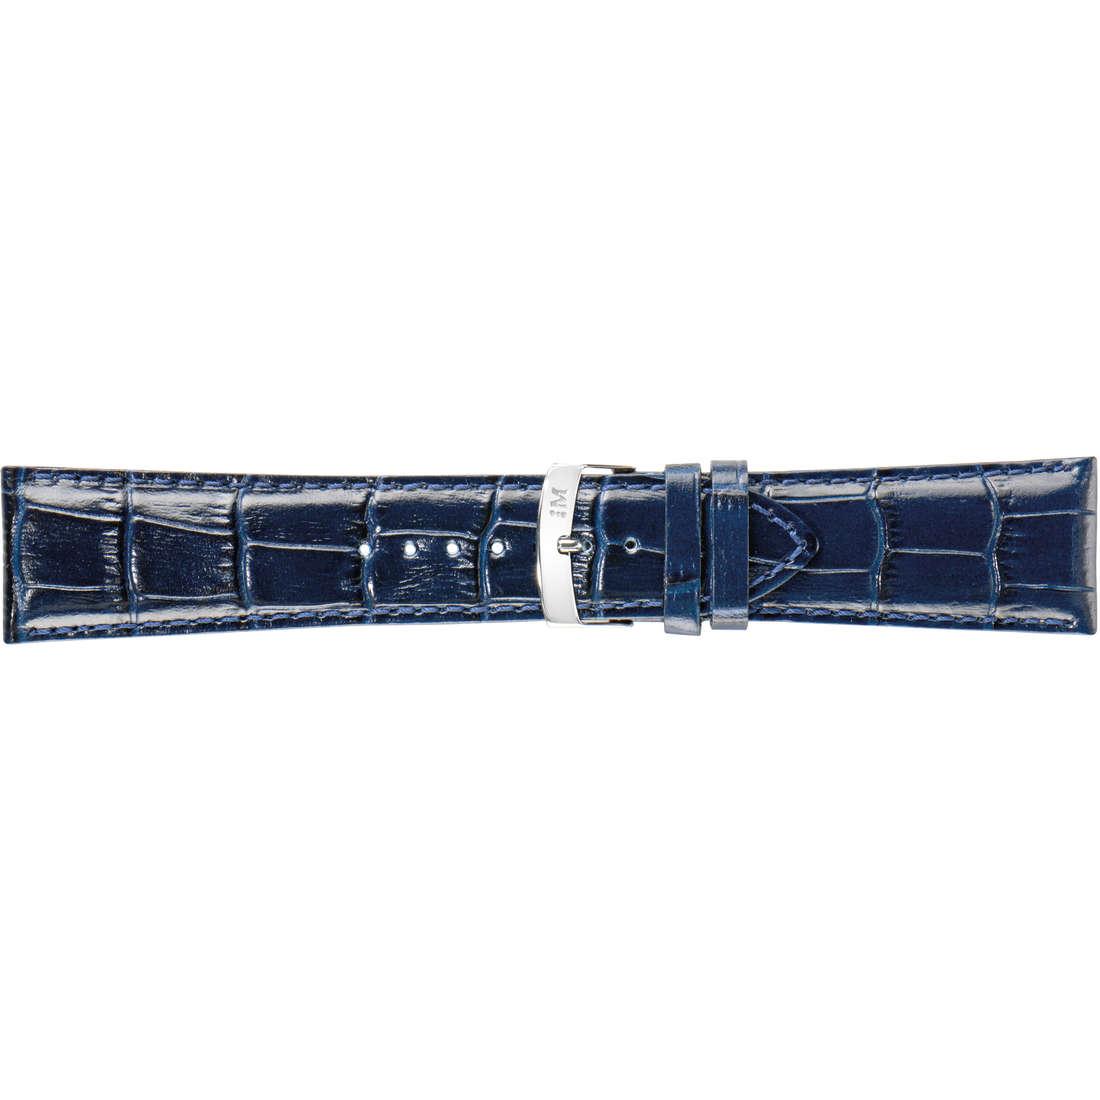 watch watch bands watch straps man Morellato Morellato 1930 A01X3395656062CR22